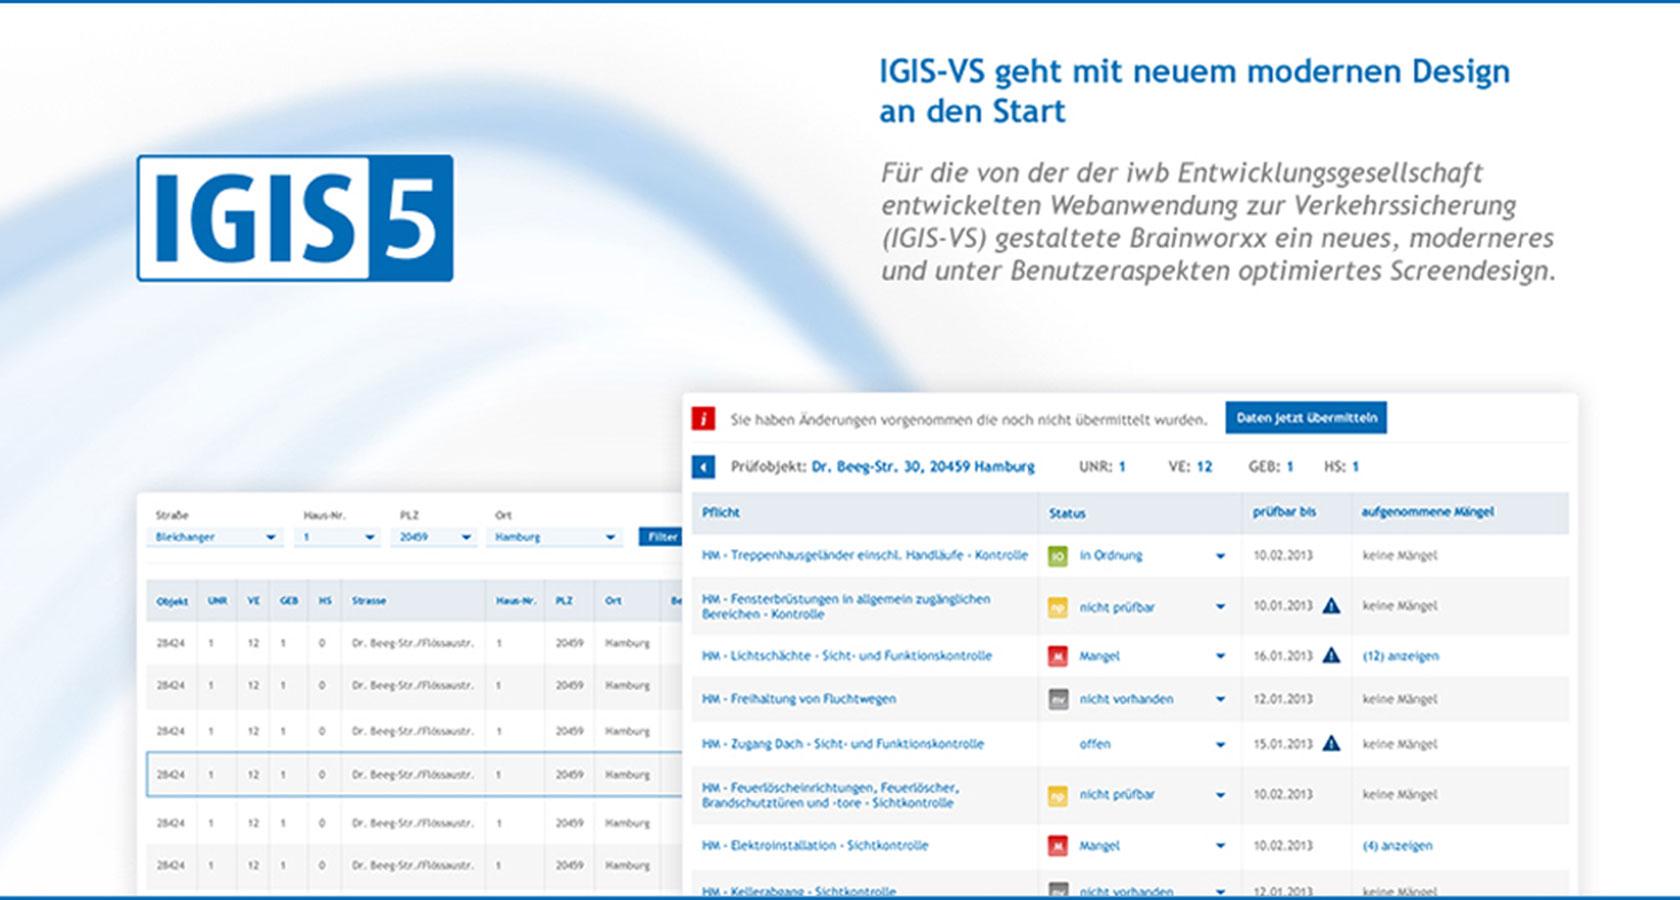 Screens der iwb Webanwendung zur Verkehrssicherung